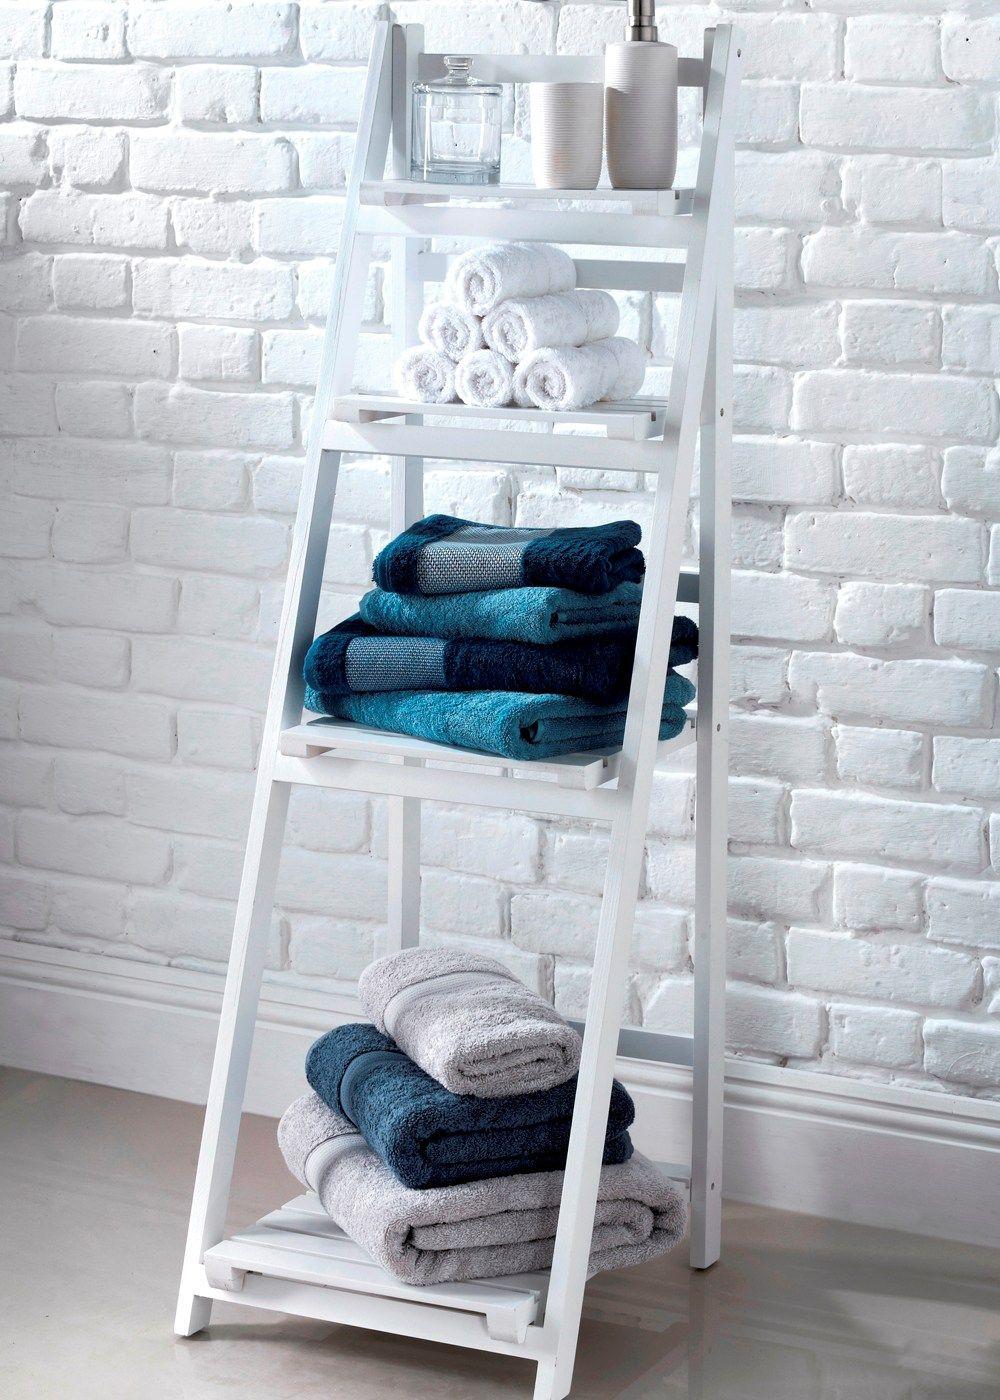 Bathroom Storage Laundry Baskets Wicker Laundry Bins inside measurements 1000 X 1400